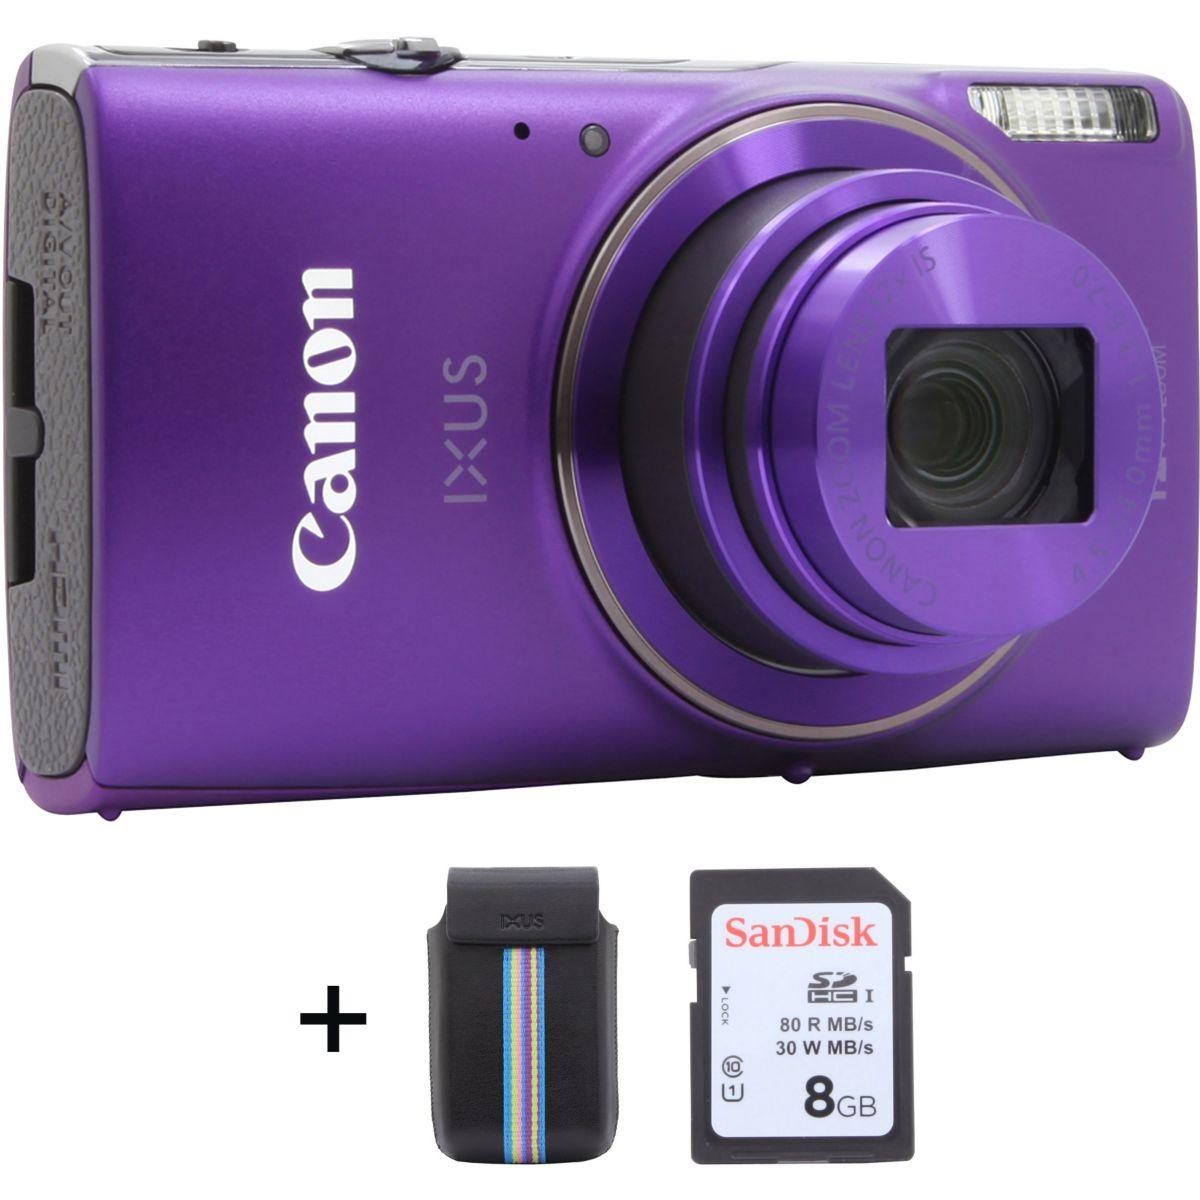 Appareil photo Compact CANON Ixus 285 HS Pourpre + Etui + SD 8...